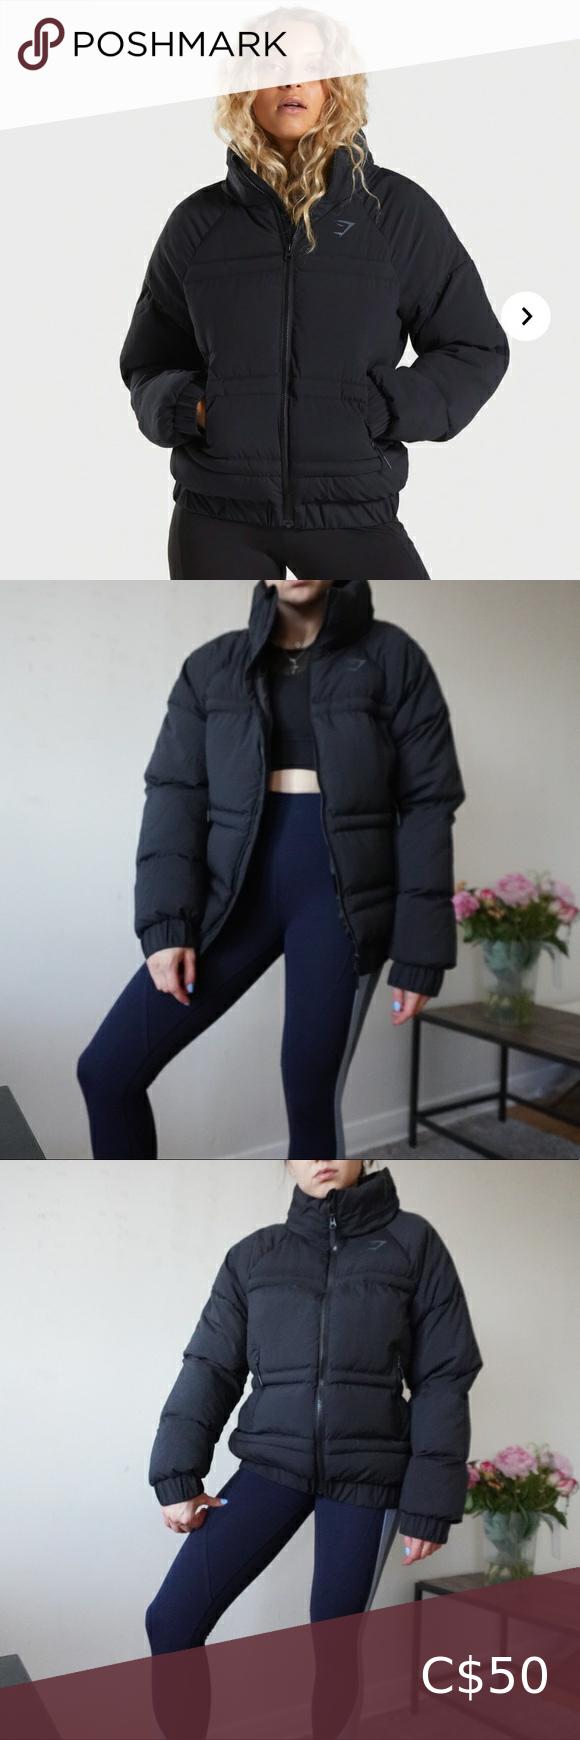 Gymshark Essential Puffer Jacket Jackets Puffer Jackets Jackets For Women [ 1740 x 580 Pixel ]